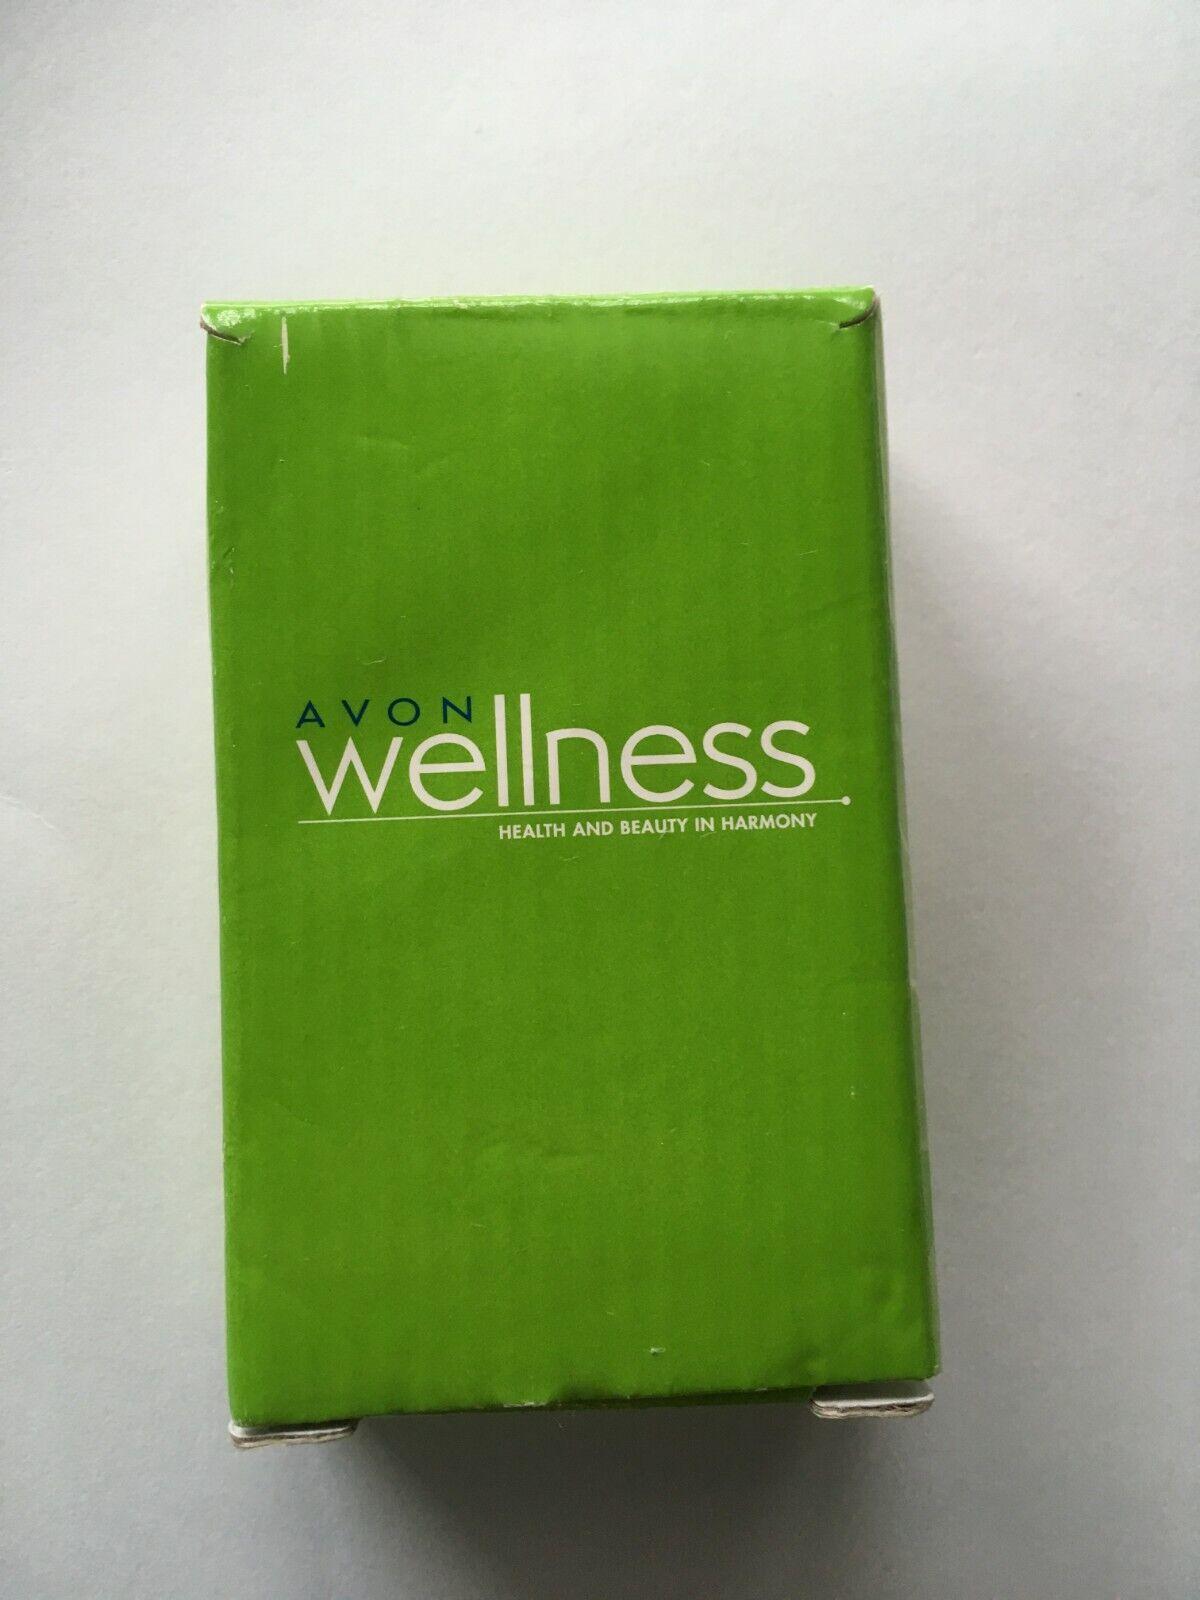 Avon Wellness Digital Pill Box. White Color. New Batteries.